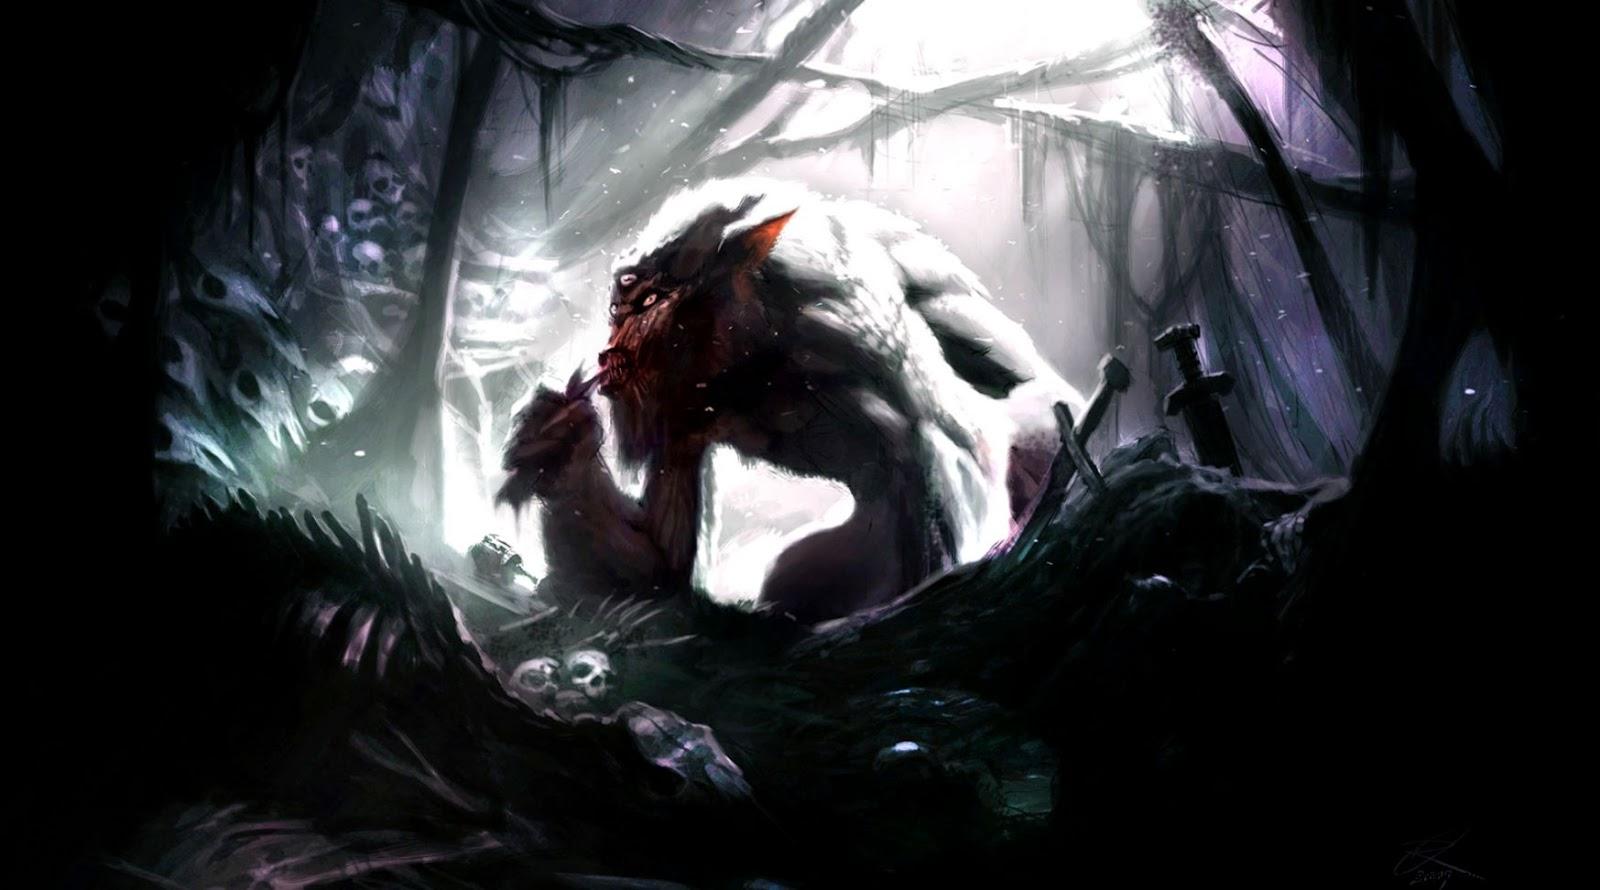 Dragonborn The Elder Scrolls V Skyrim Artwork Video Games Wallpaper